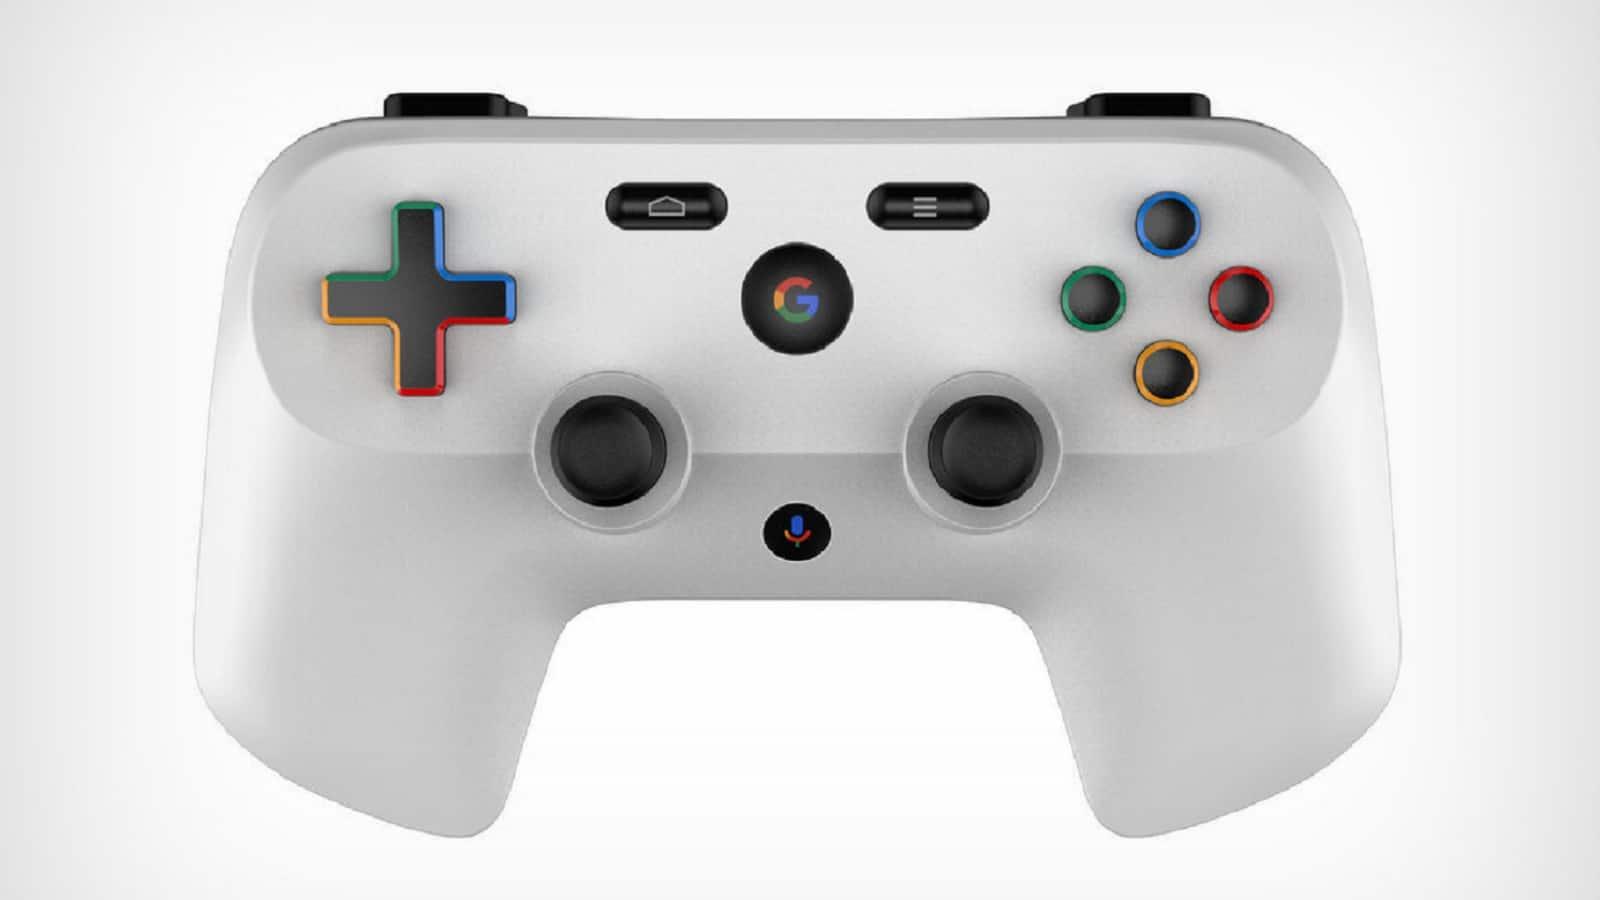 google project stream controller mockup from yanko design